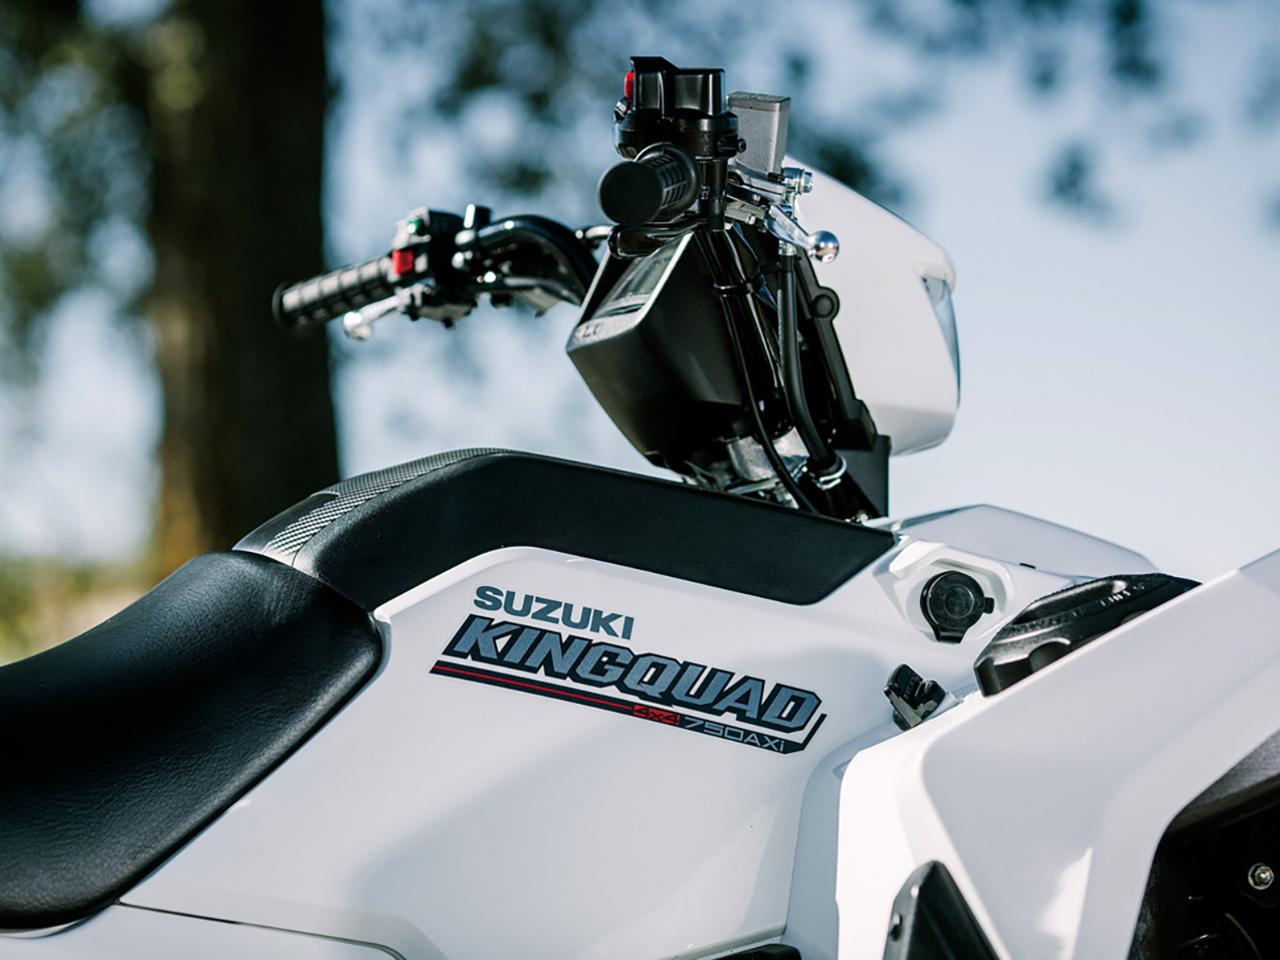 Suzuki KingQuad 750 4×4 Power Steering SE 2019 - Snow White ⋆ Motorcycles R  Us